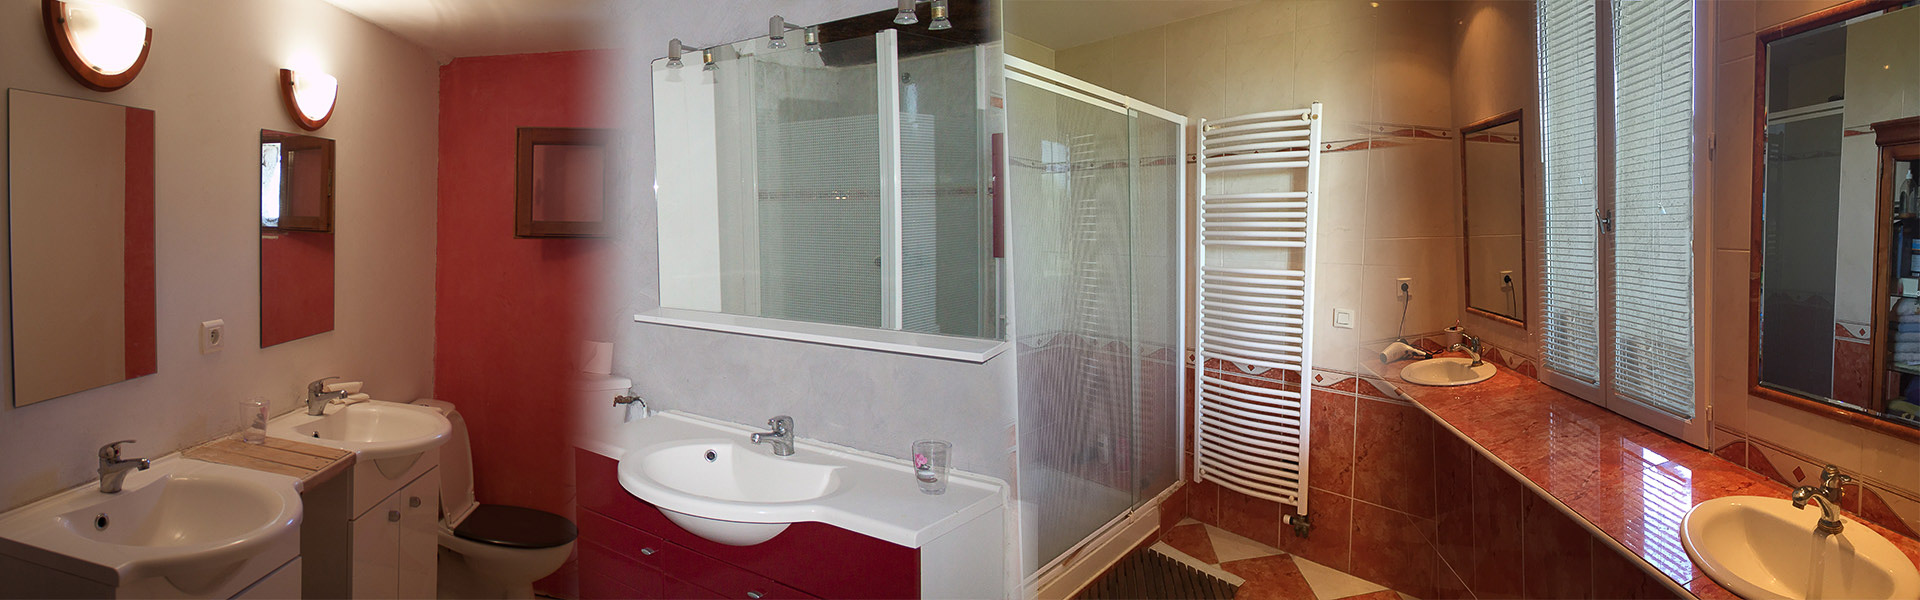 salle de bain familha et serena